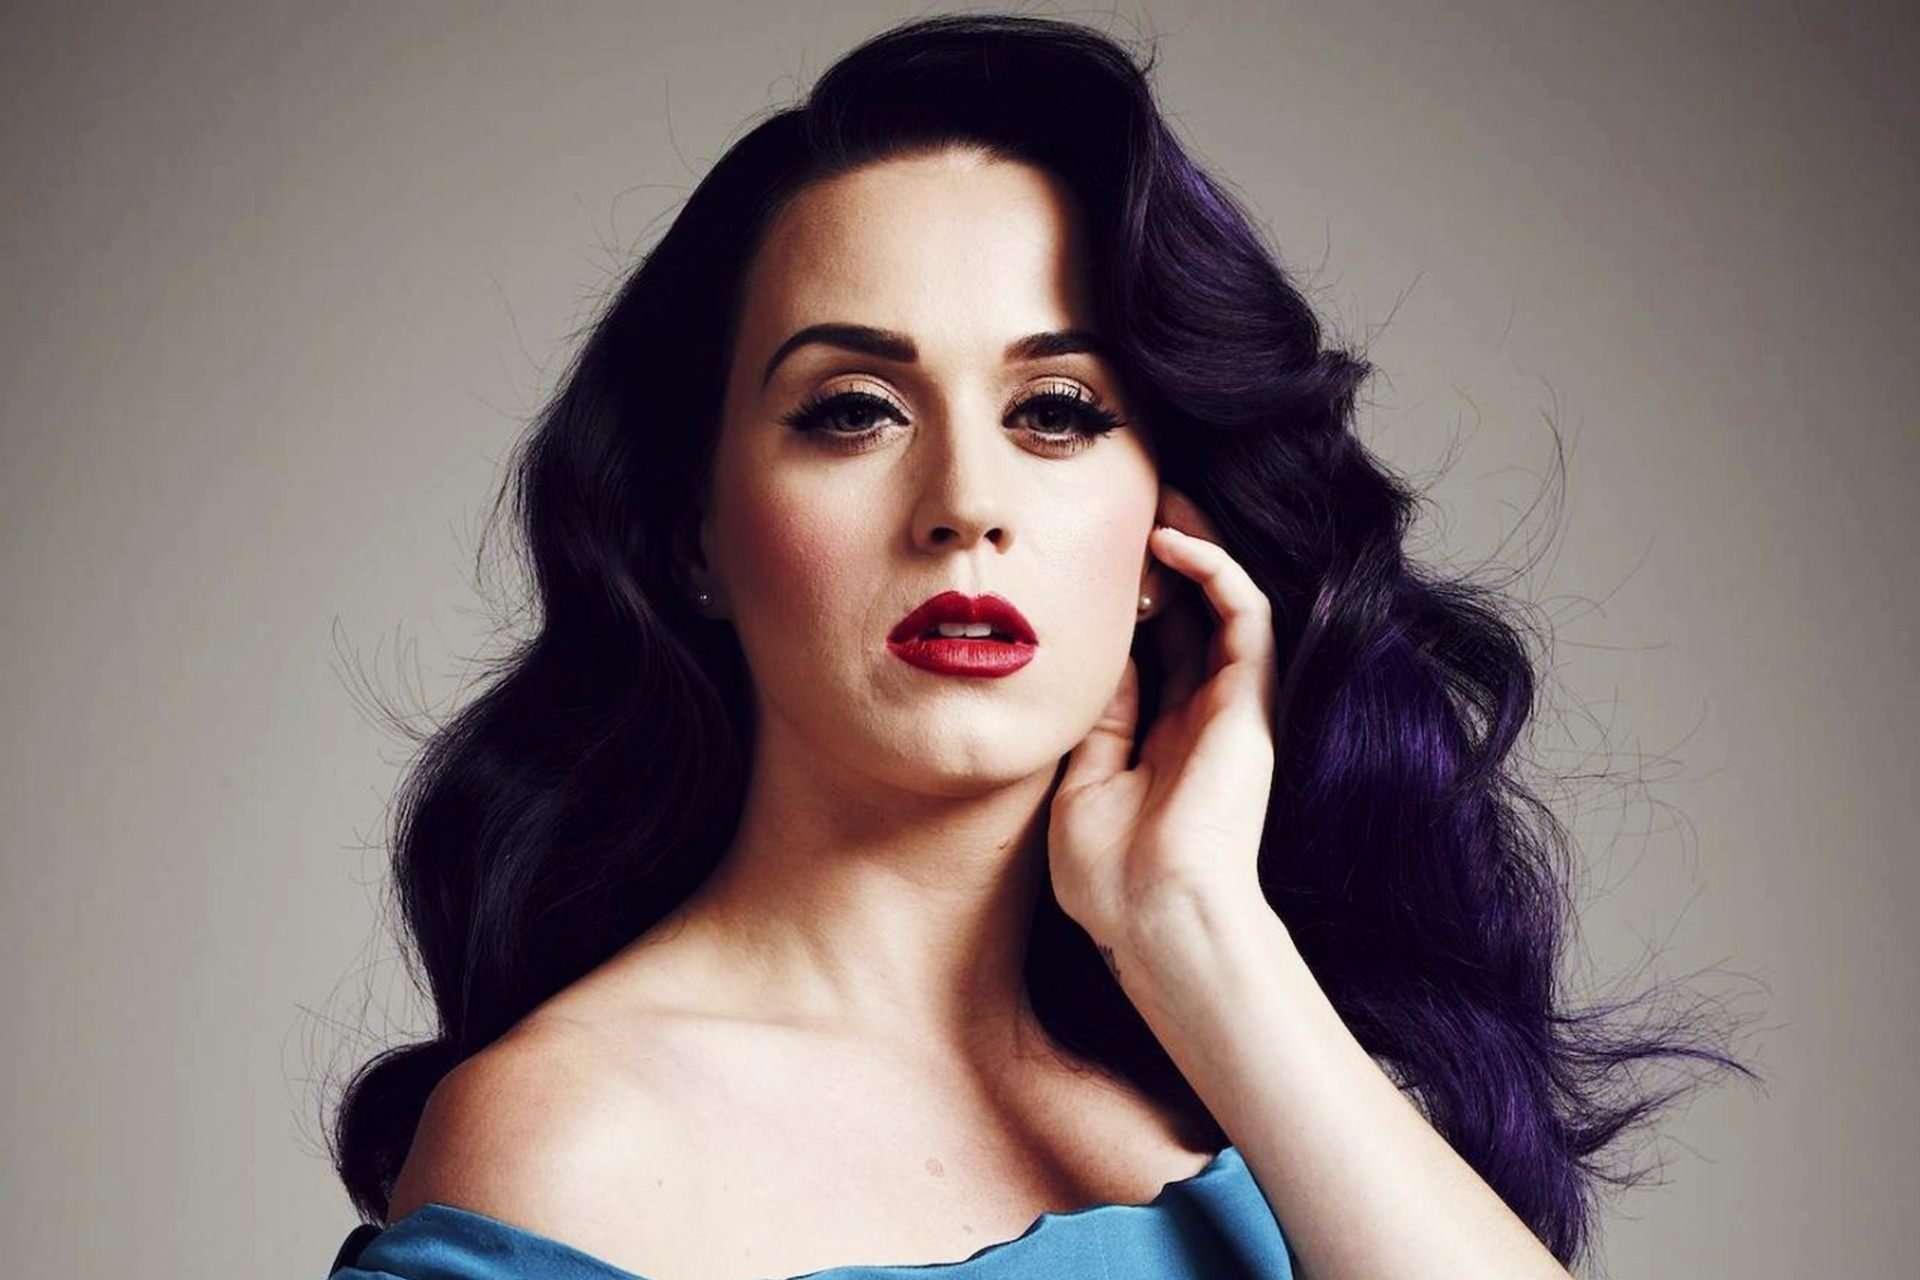 Katy perry #6